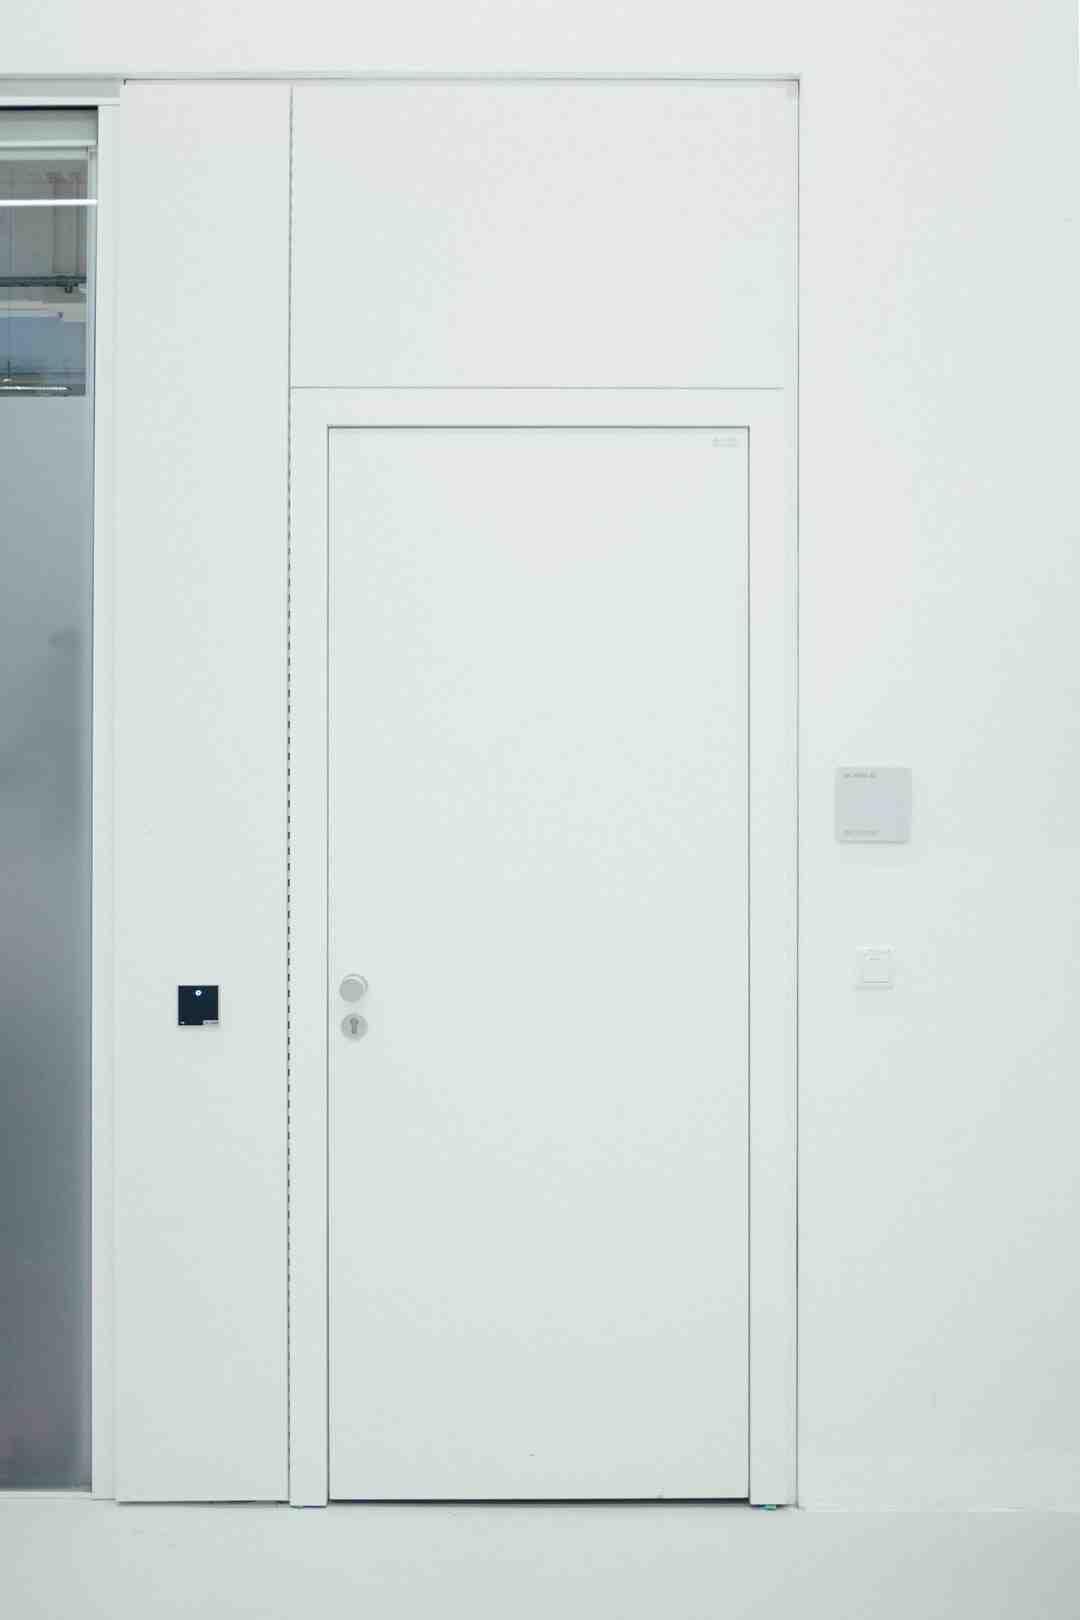 Comment isoler une porte du bruit ?